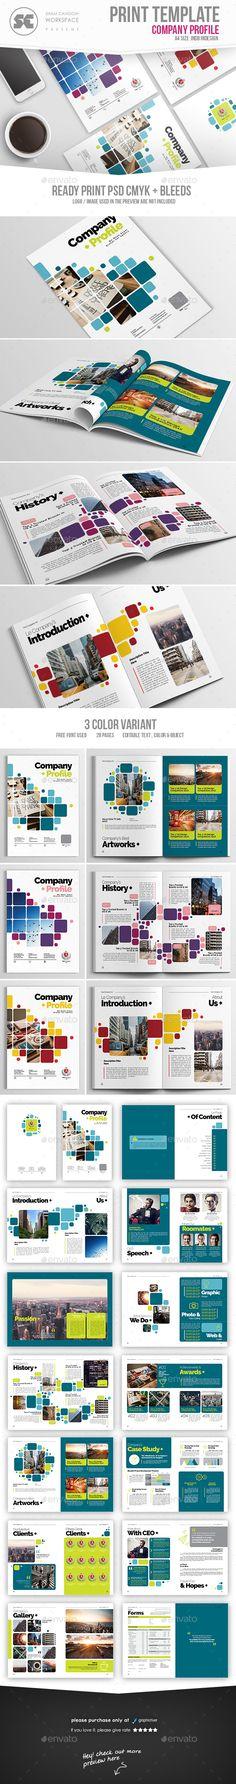 Company Profile 2017 Pinterest Company profile, Company profile